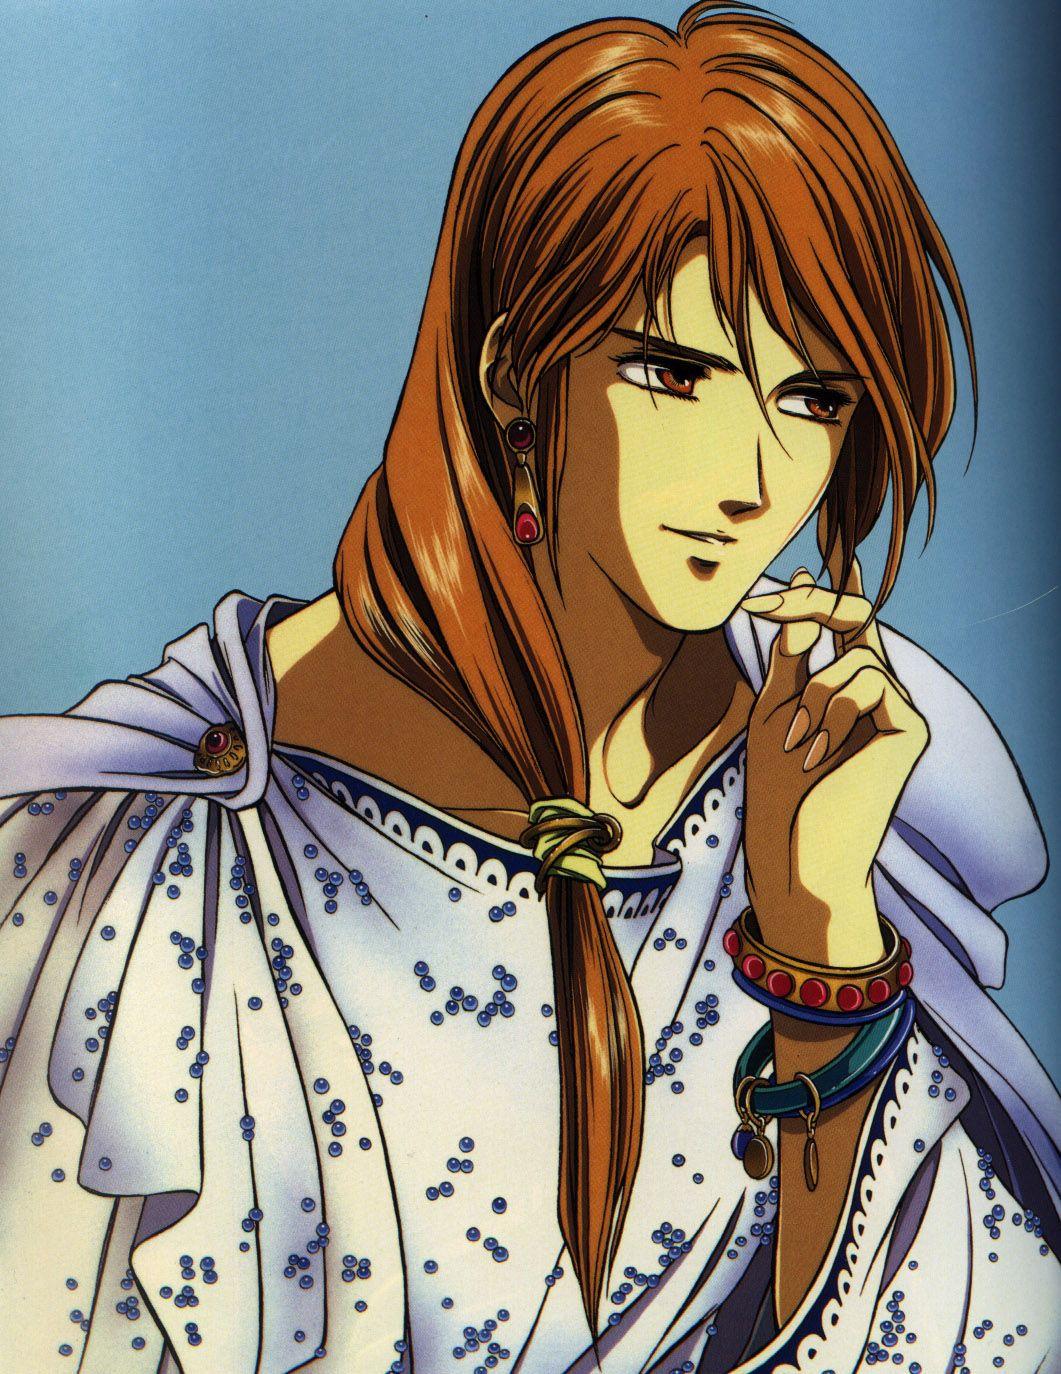 Narsus from heroic legend of arislan anime novel